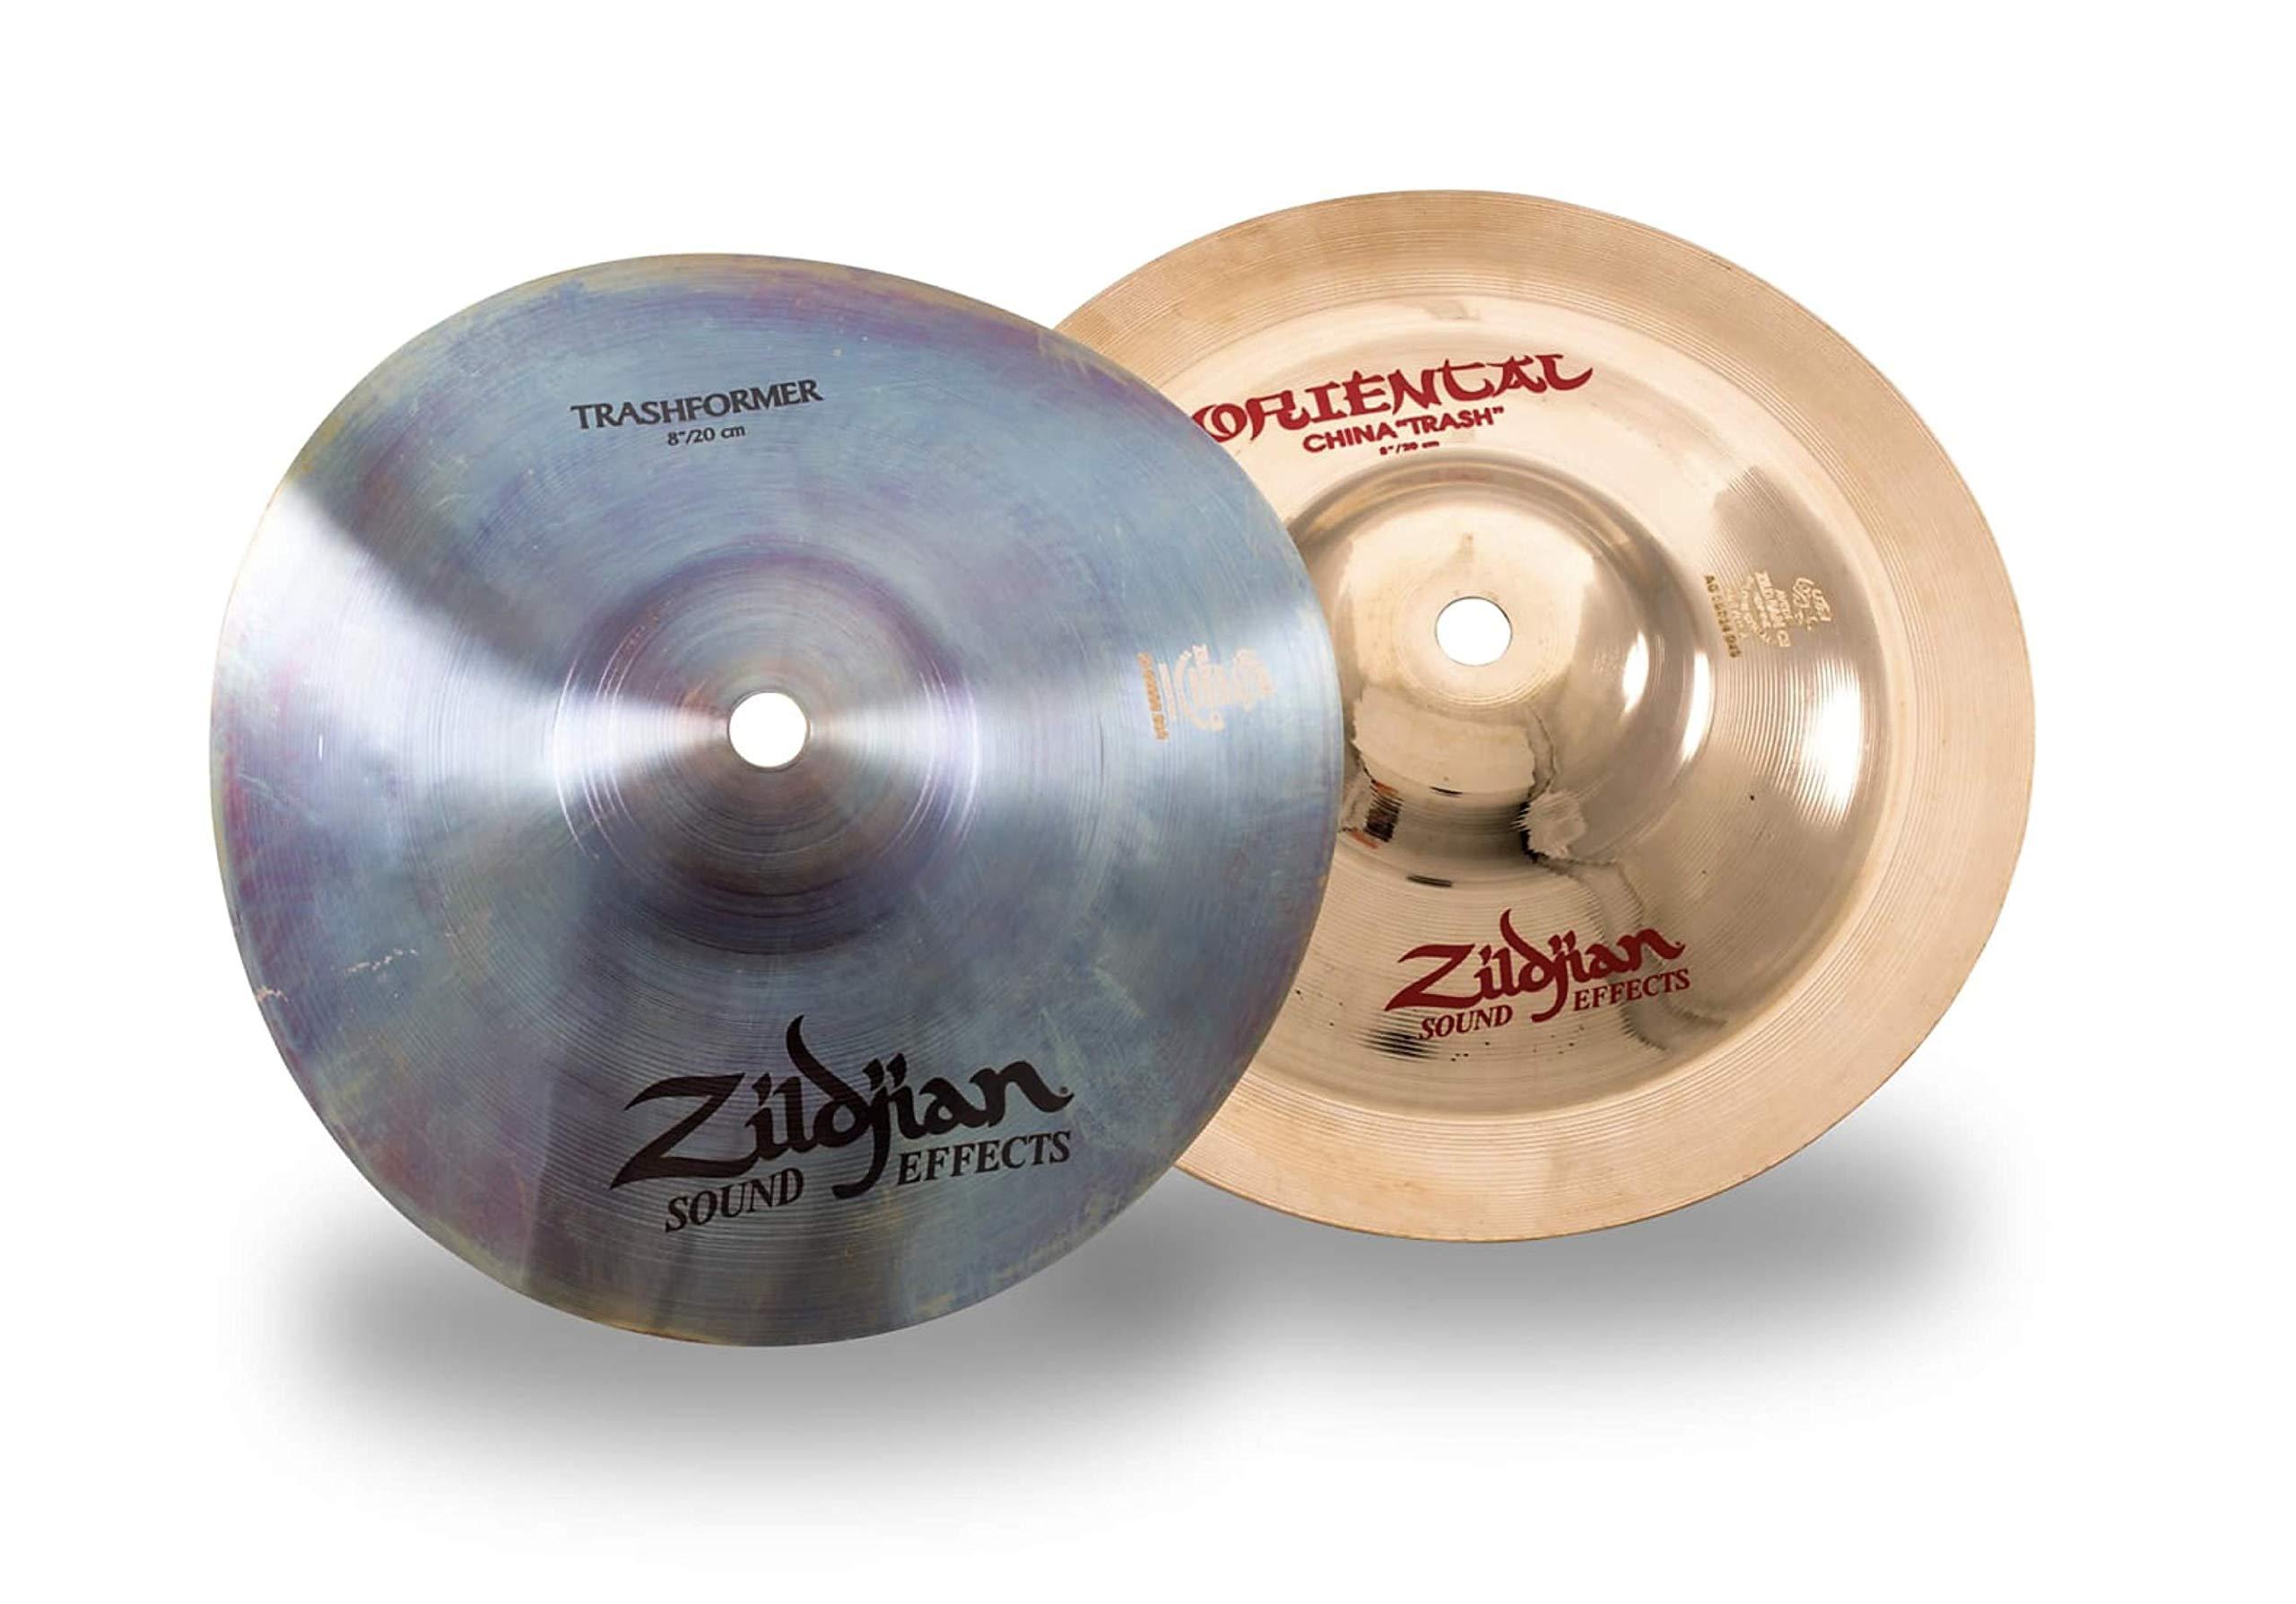 Zildjian PCS001 Cymbal Stack 8'' Trashformer and 8'' Oriental Trash China by Avedis Zildjian Company